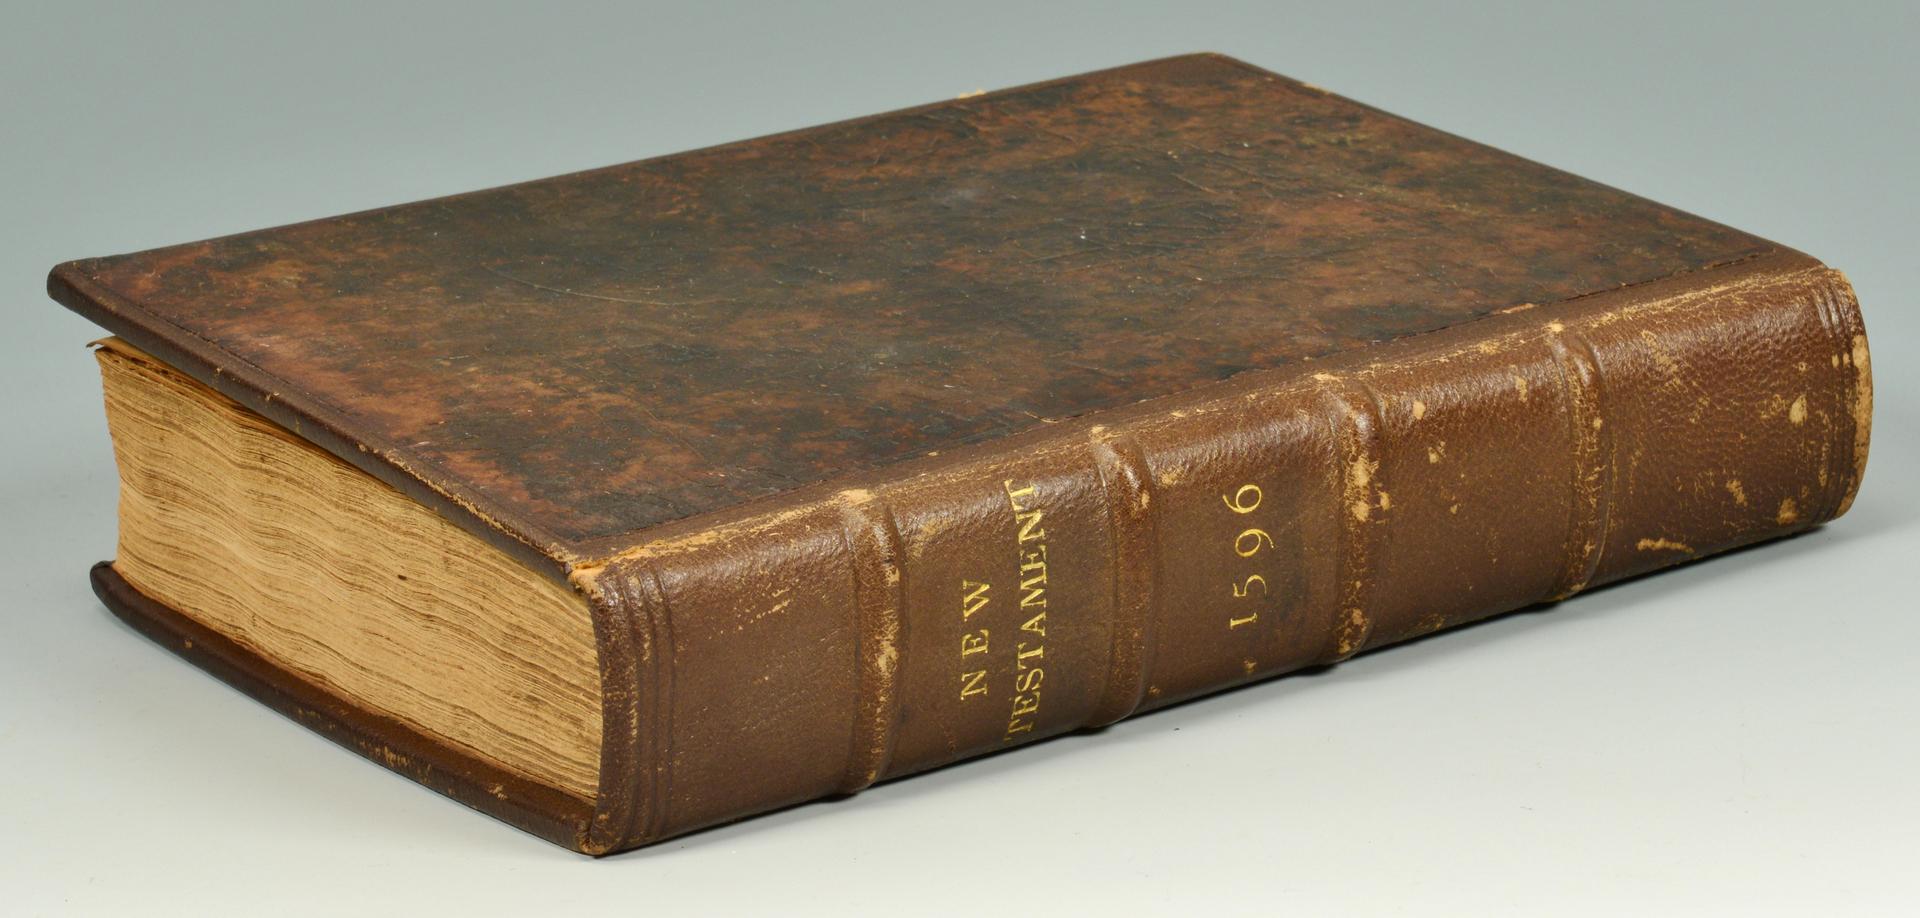 Lot 3088186: 1596 Geneva Bible New Testament, by Tomson